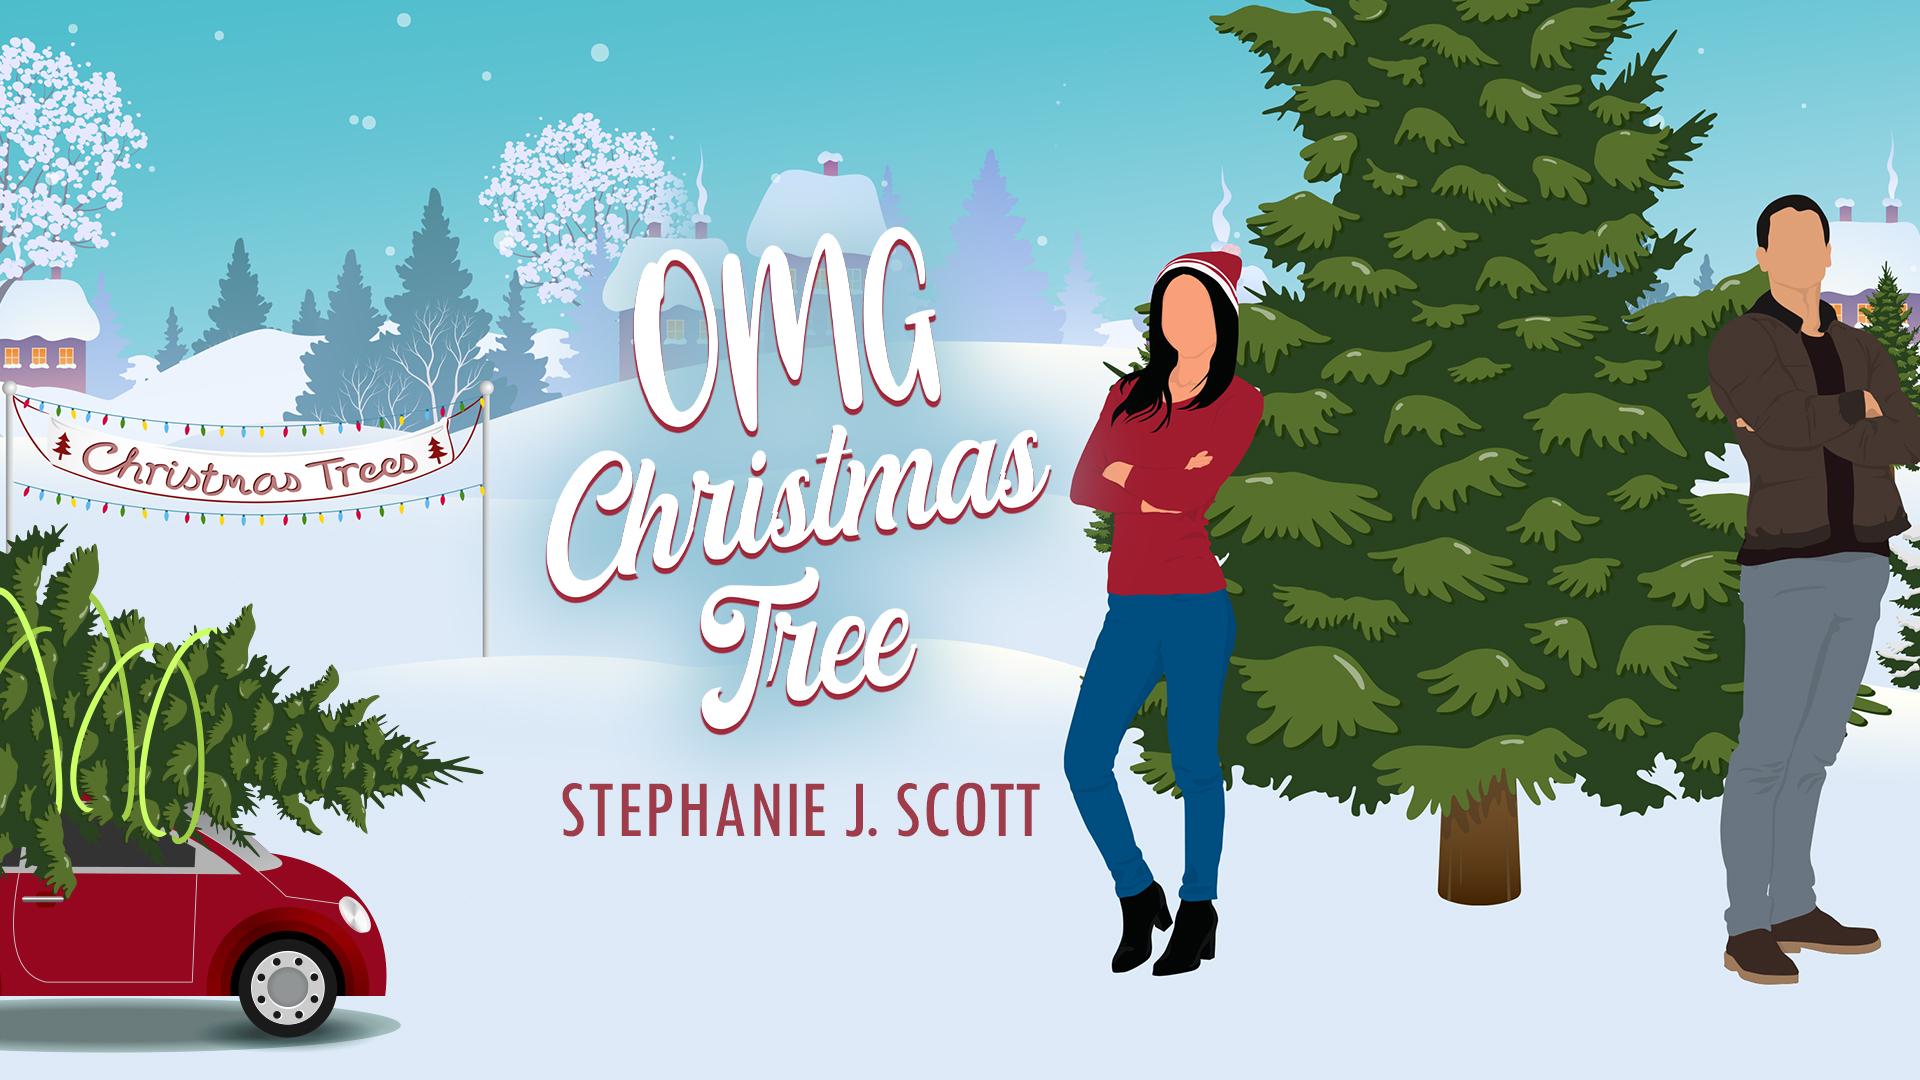 OMG Christmas Tree is here